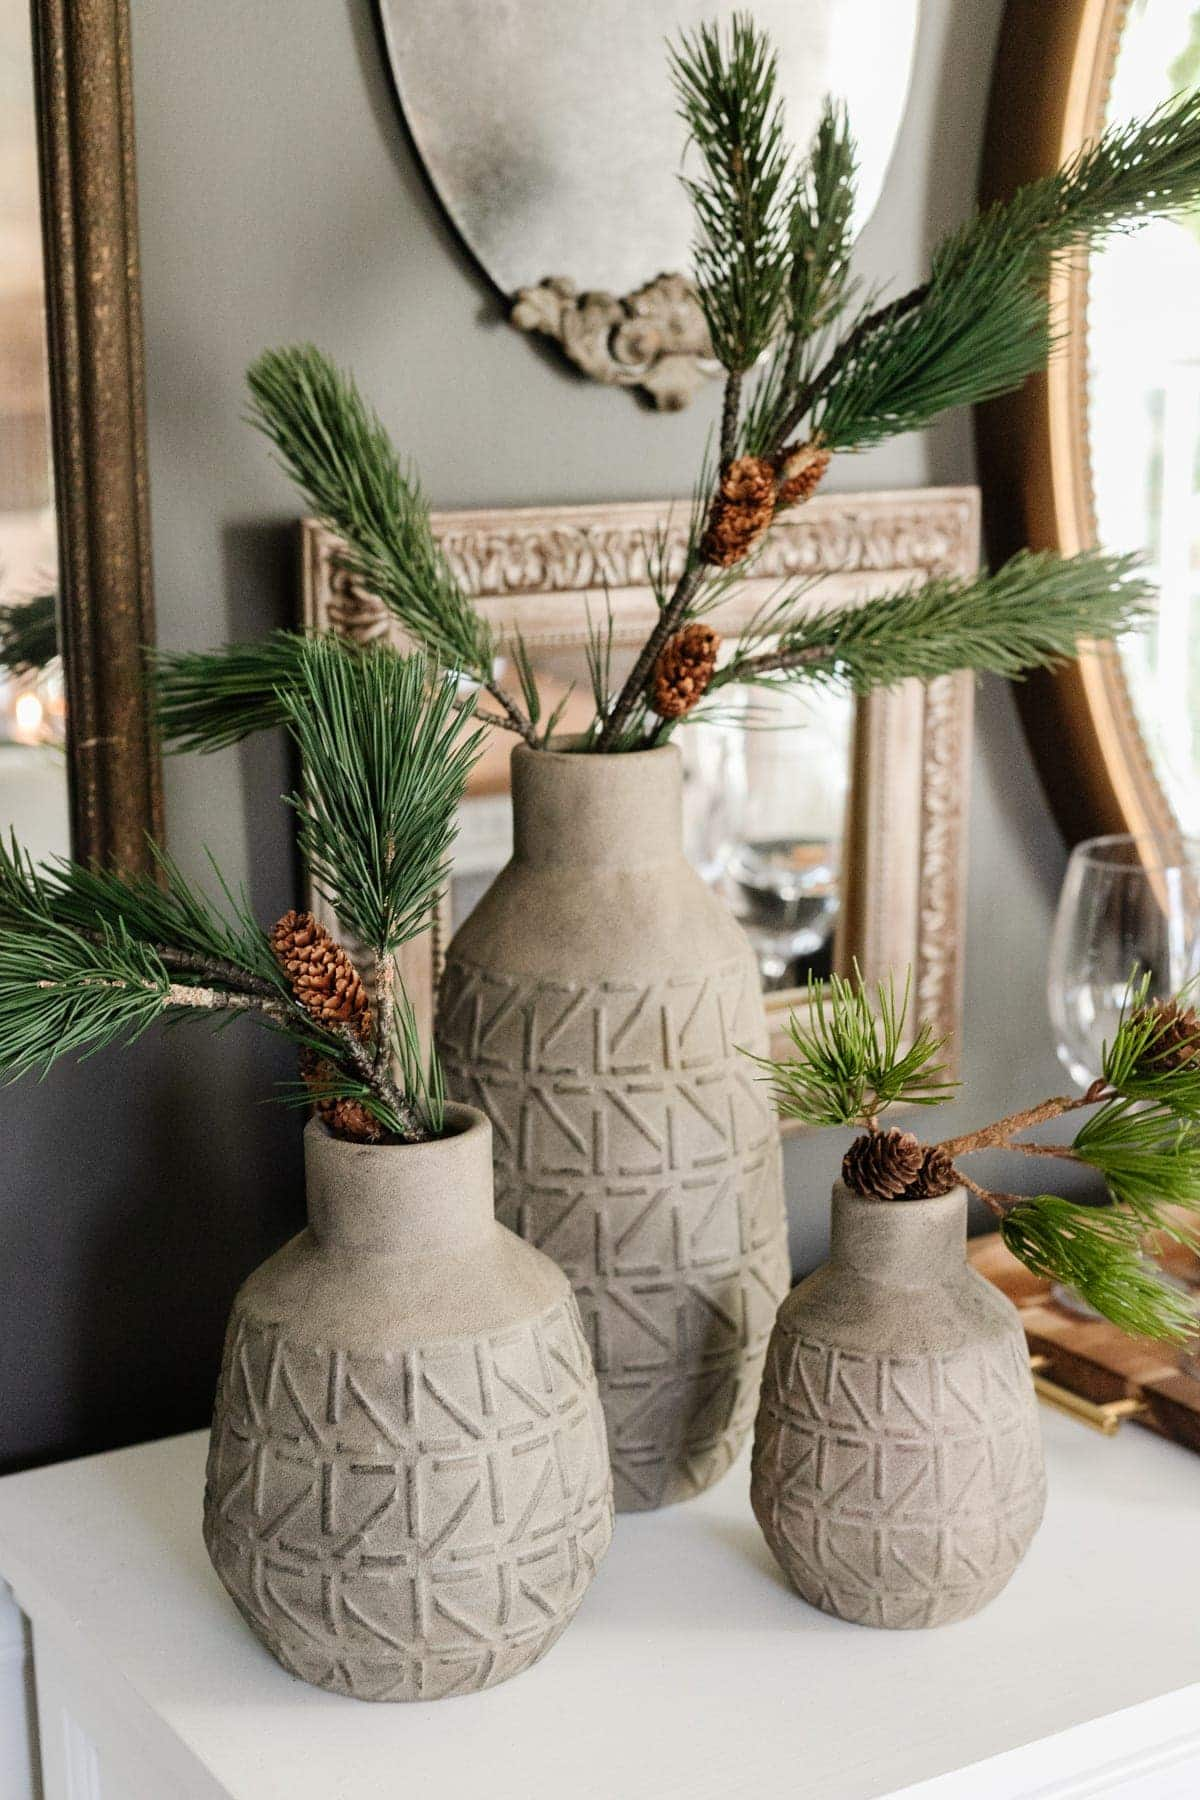 DIY painted stoneware vases